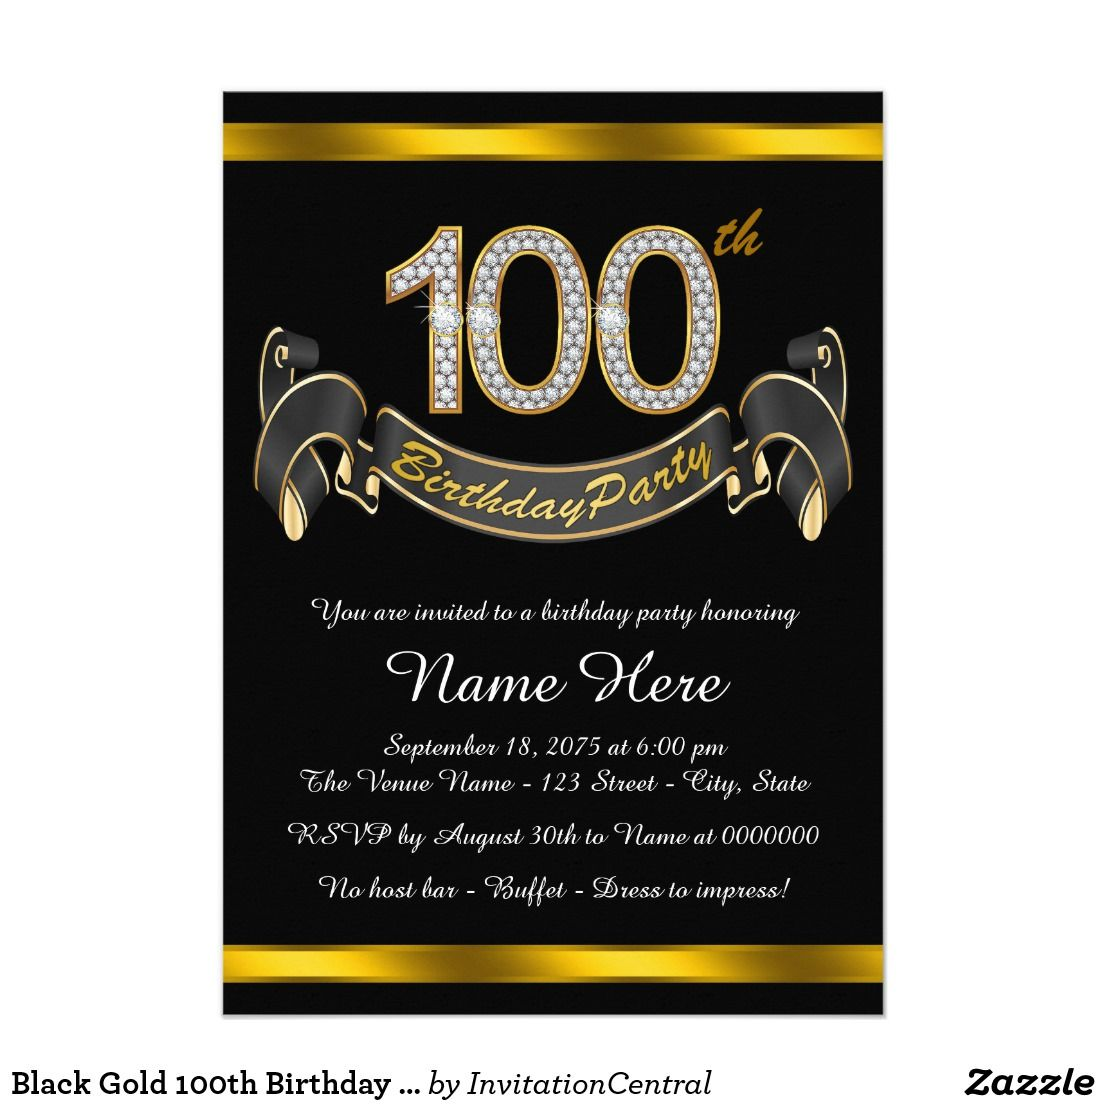 black gold 100th birthday party